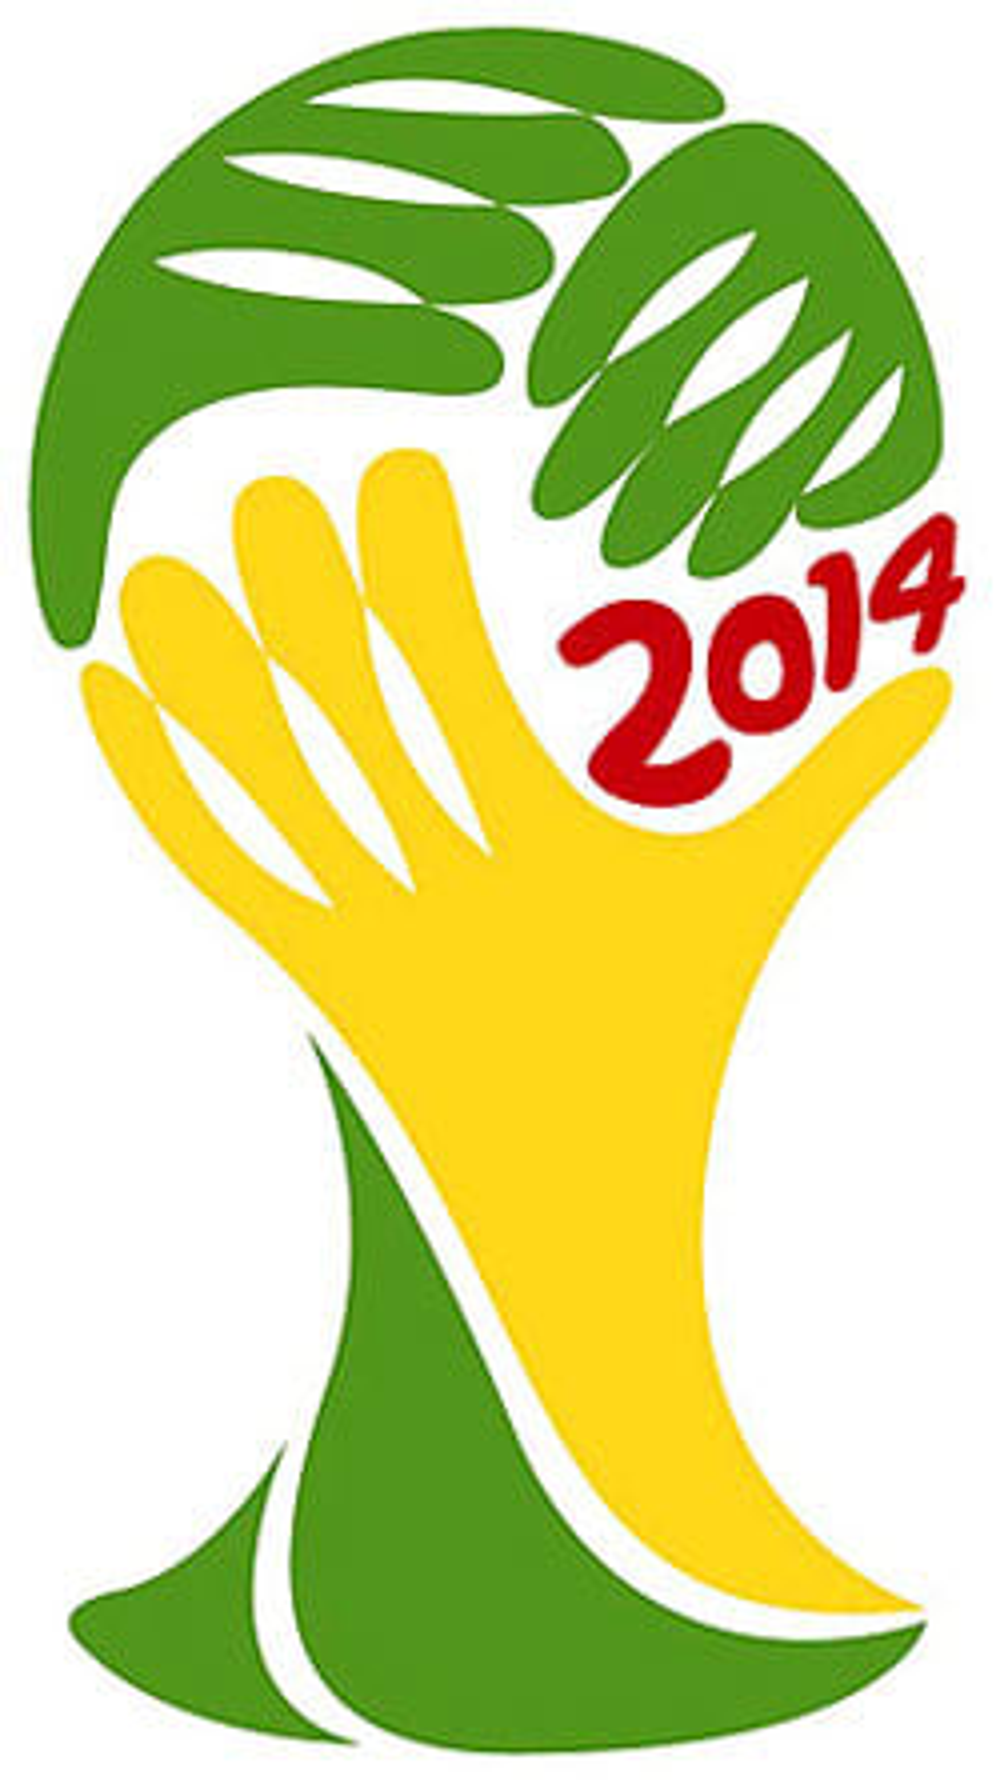 Tabela da Copa do Mundo 2014